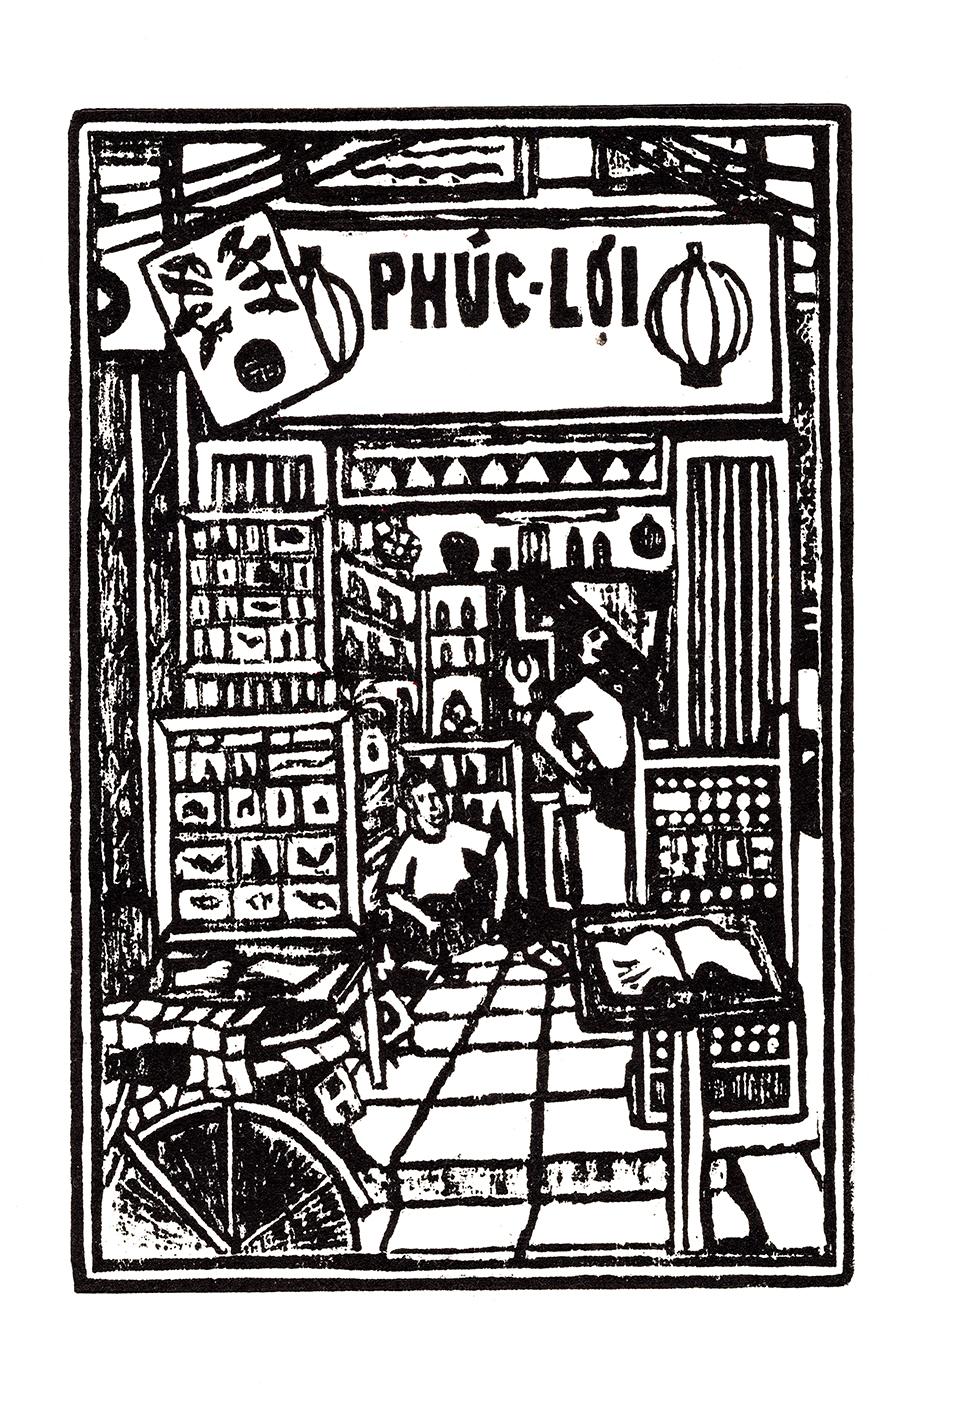 Phuc Loi Stamp Shop